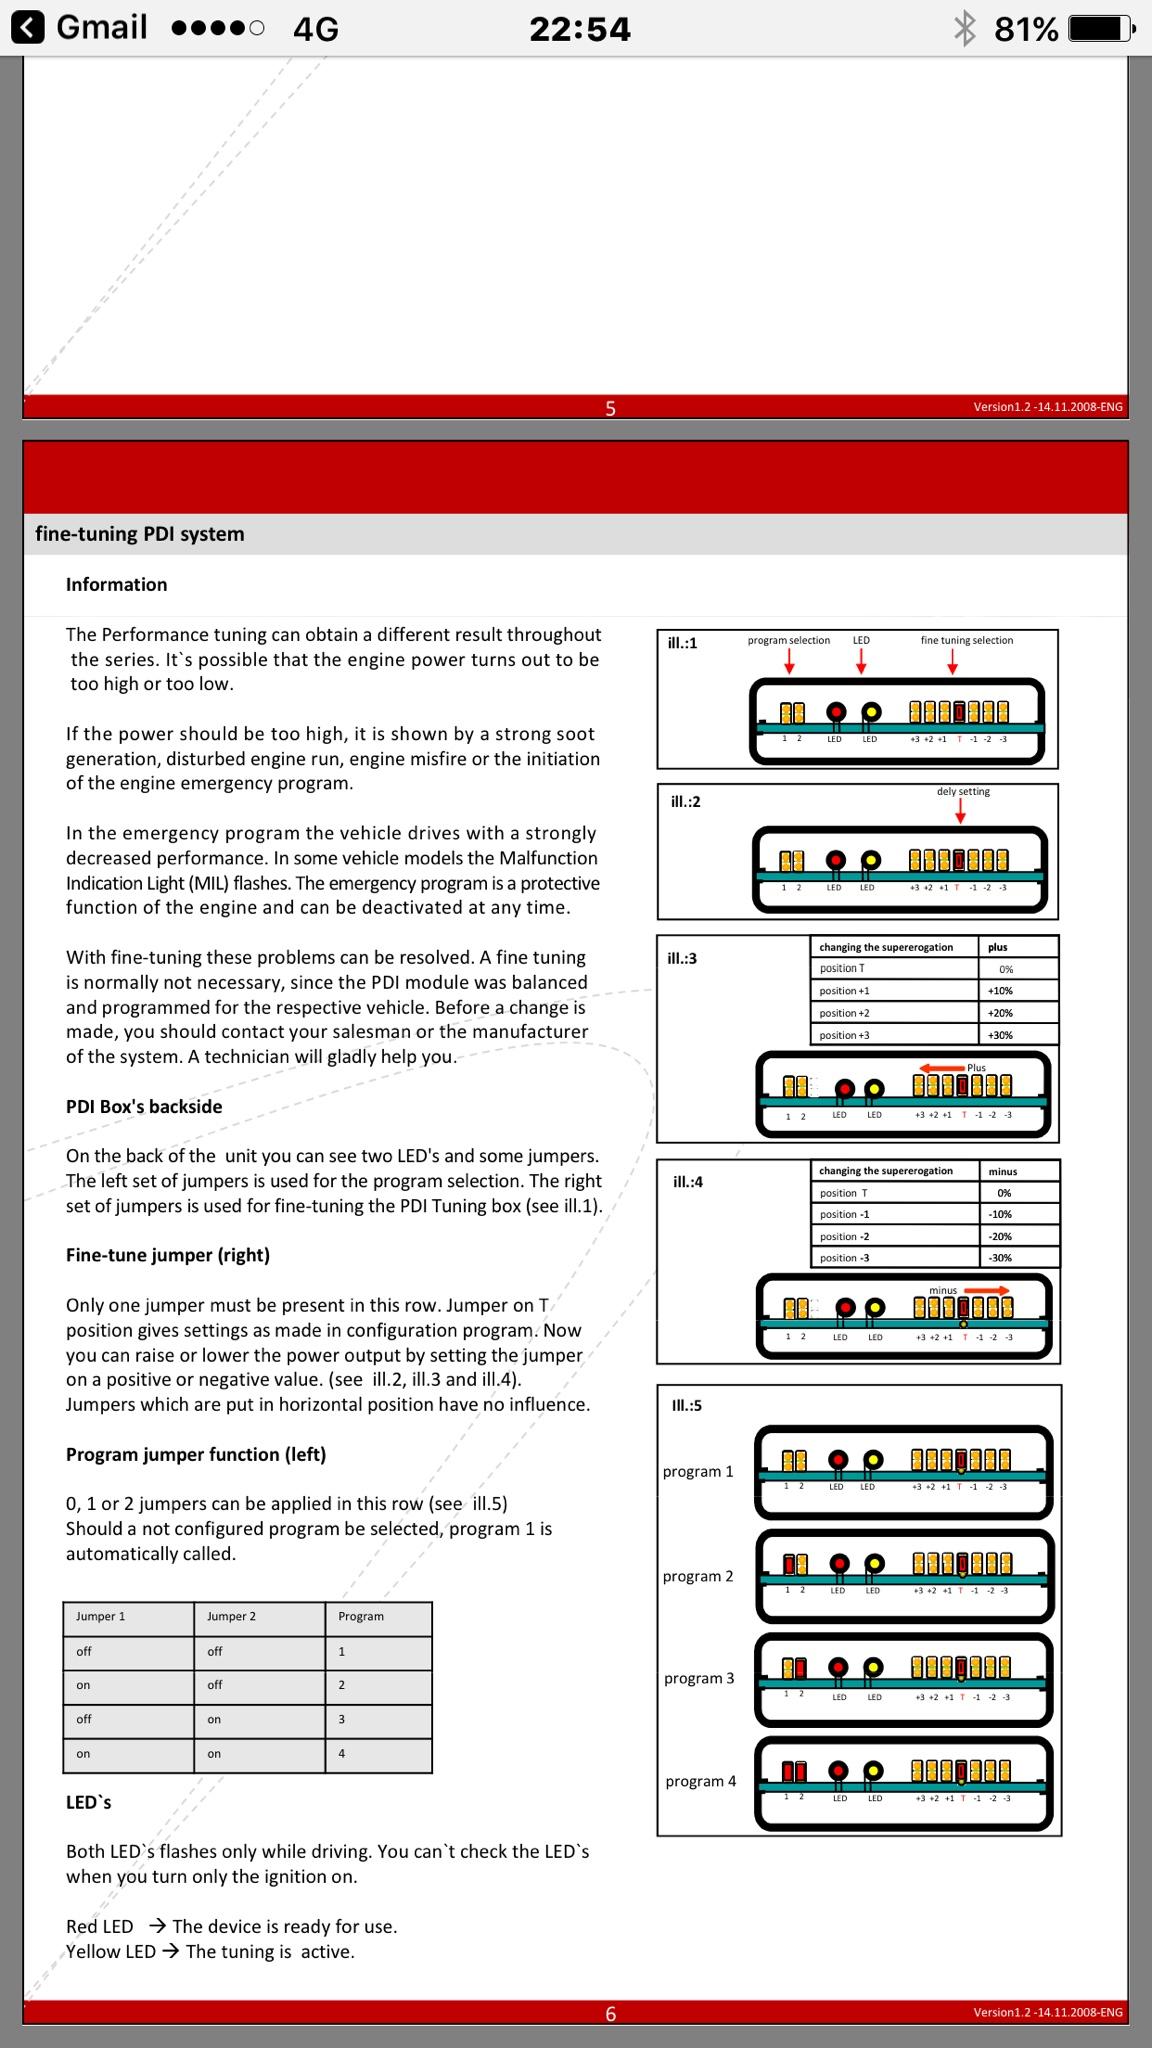 Remap DTUK tuning box settings? - Civinfo